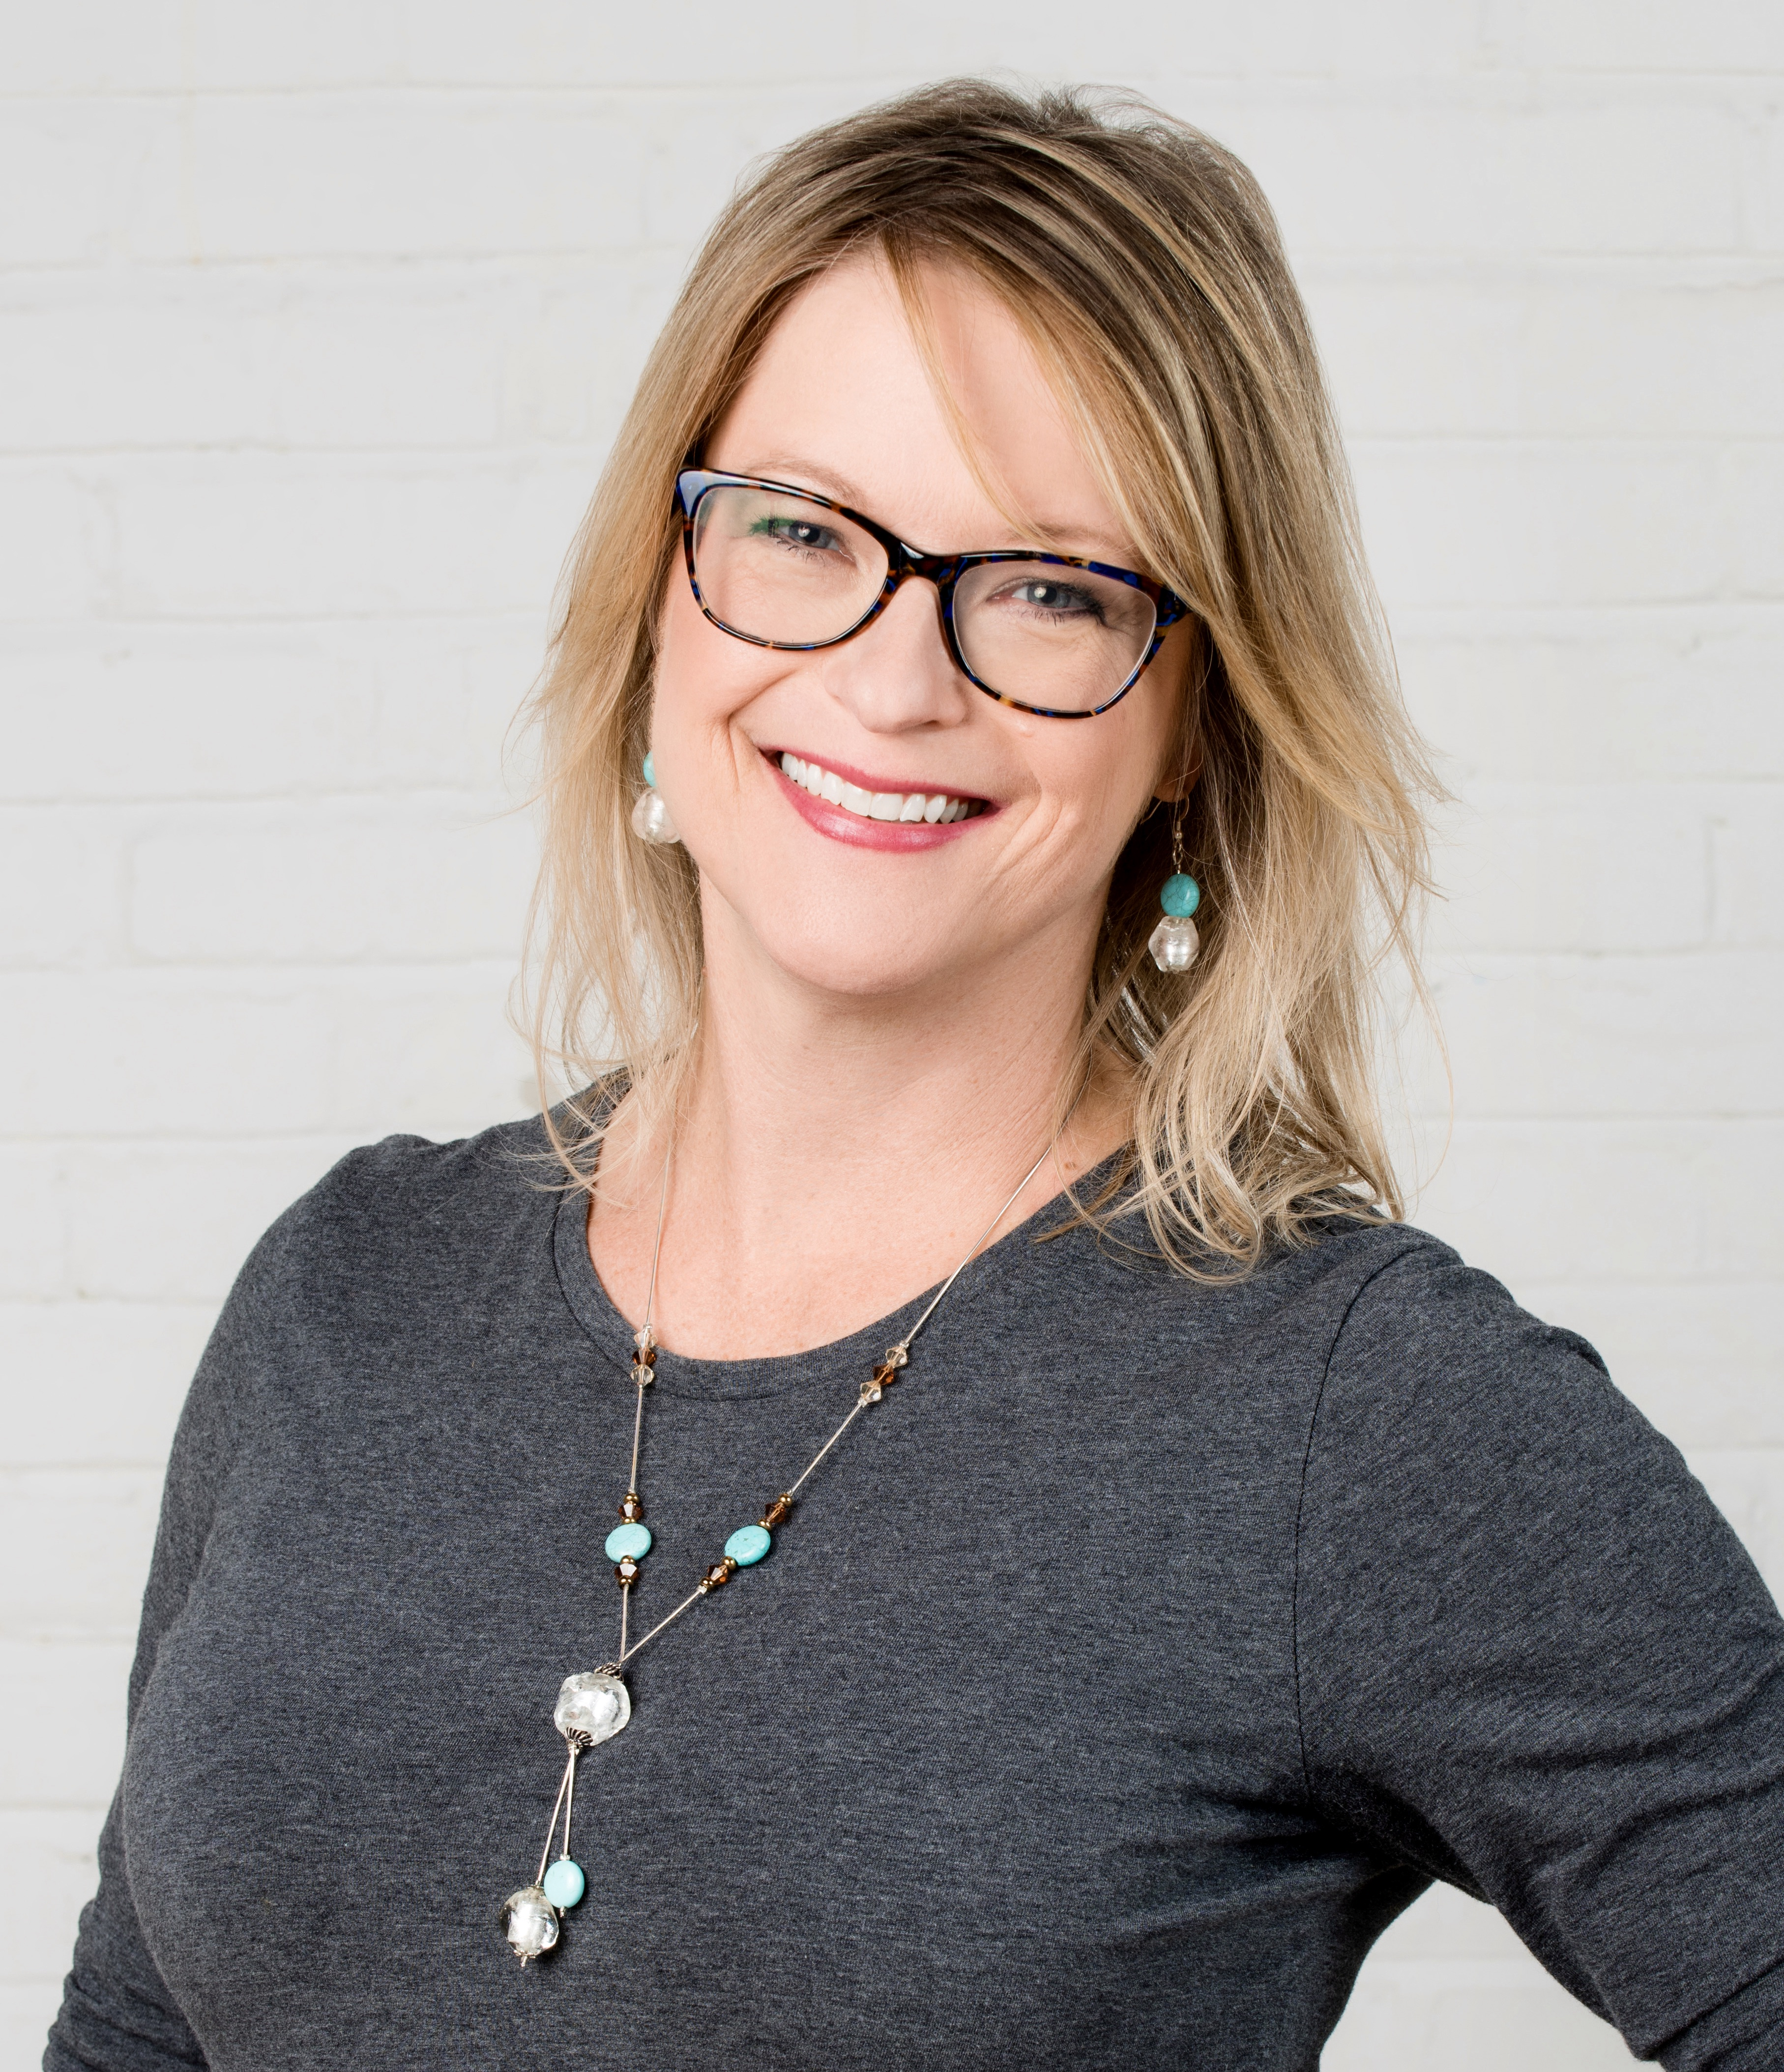 Beth-Knaus-writer-editor